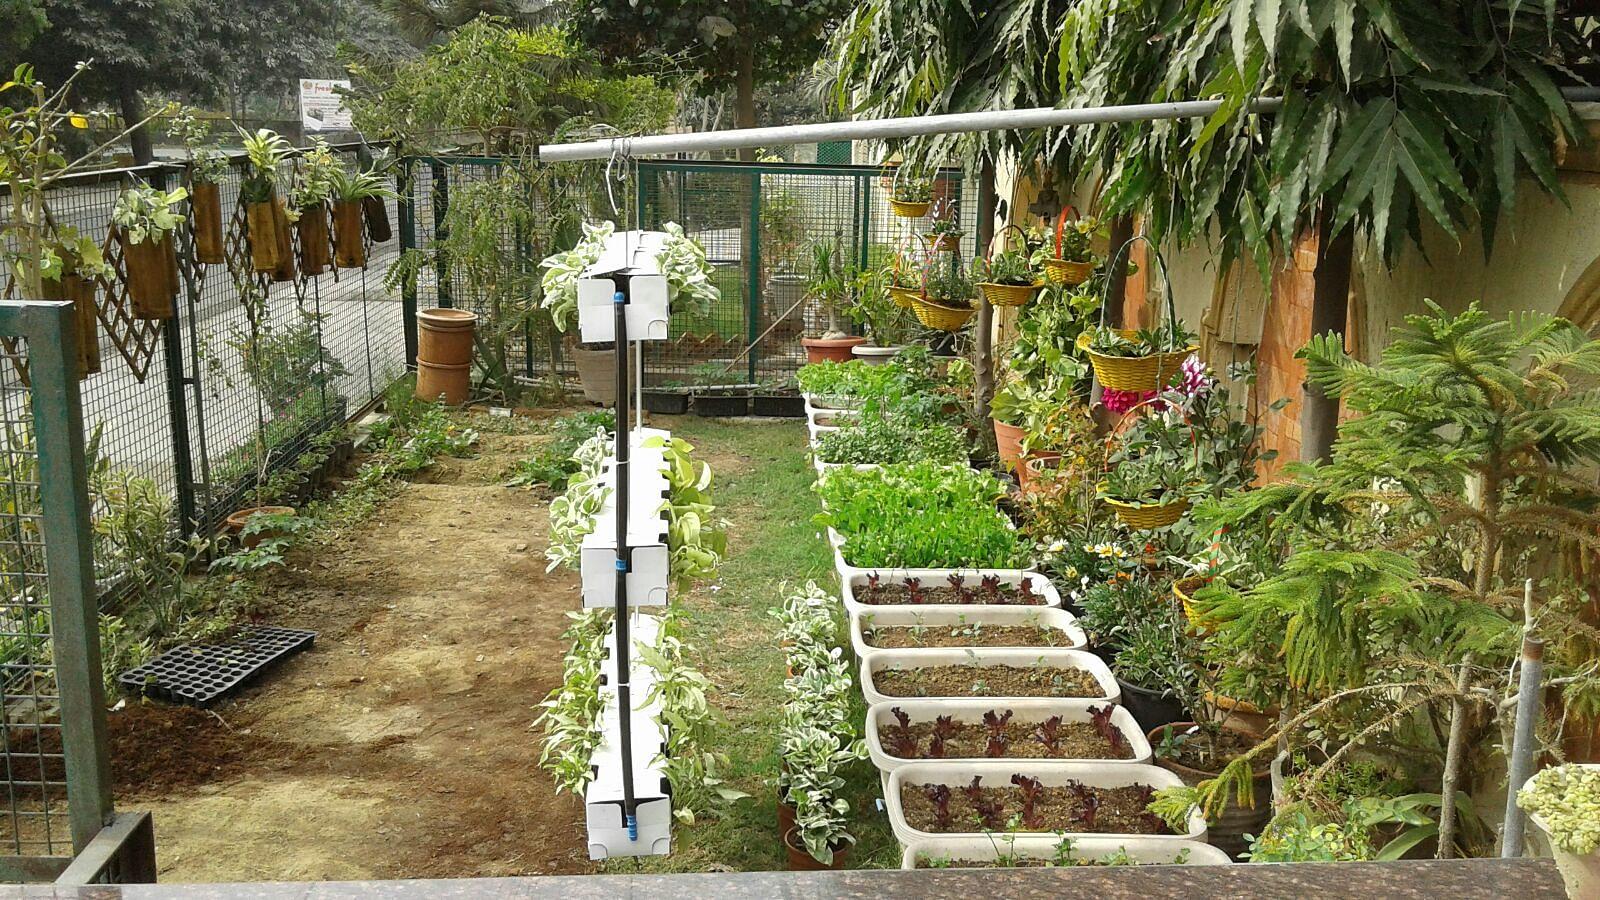 Flowering plants and vegetables grown with Bioneer compost. Photo credit: MK Garg